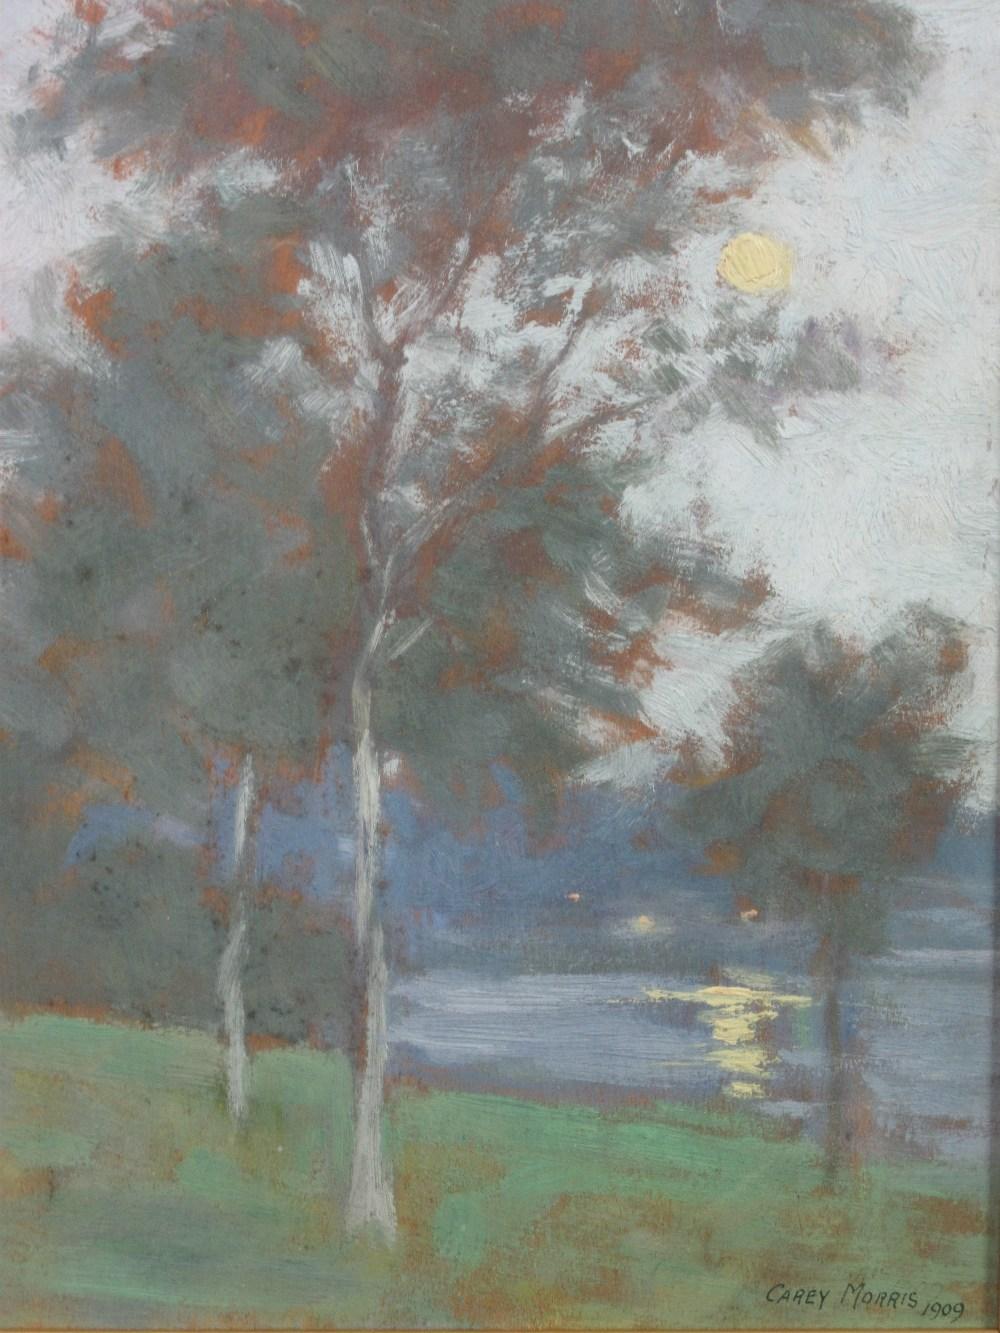 Lot 258 - CAREY MORRIS (WELSH born Llandeilo 1882,